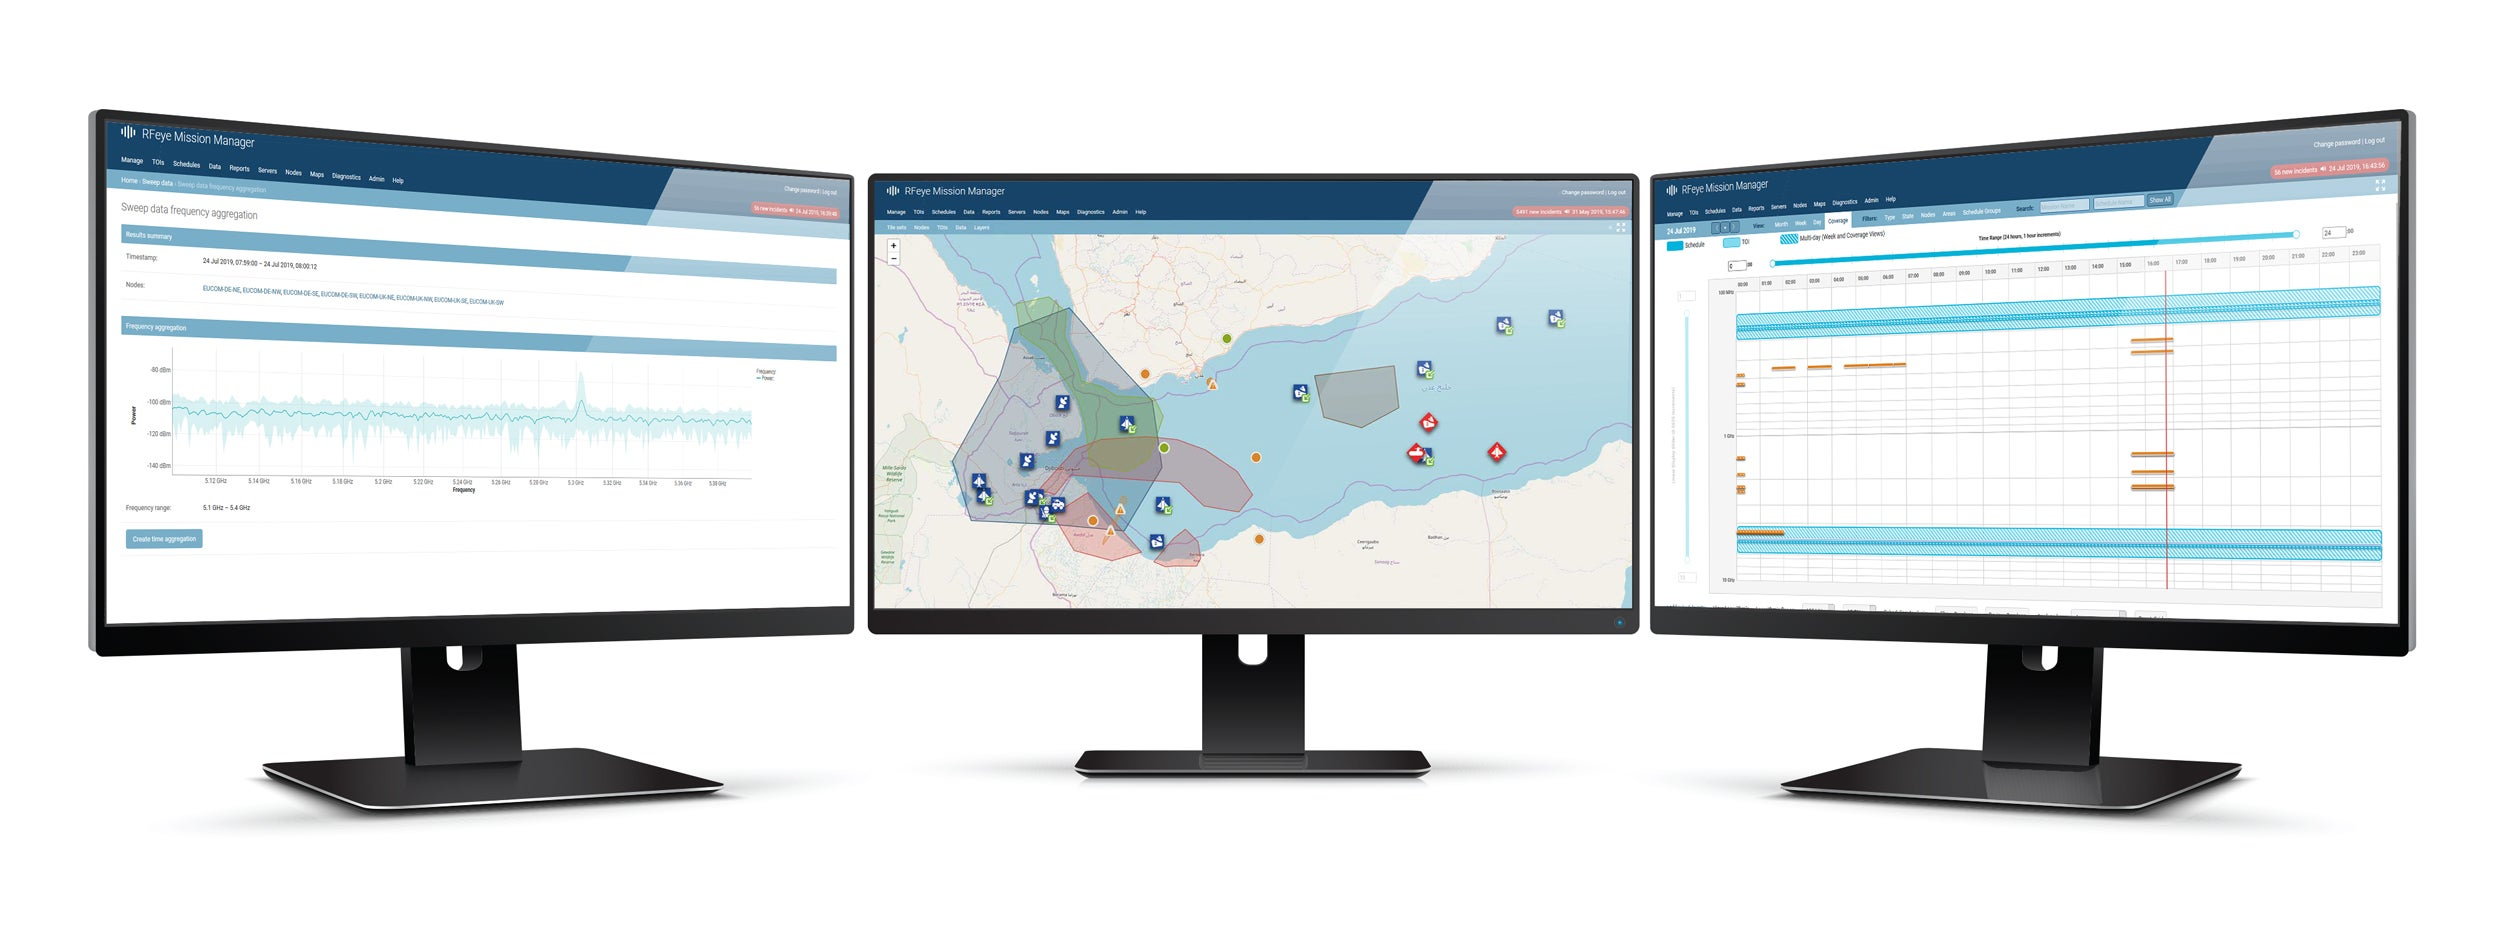 RFeye-Mission-automation-geolocation-intelligence